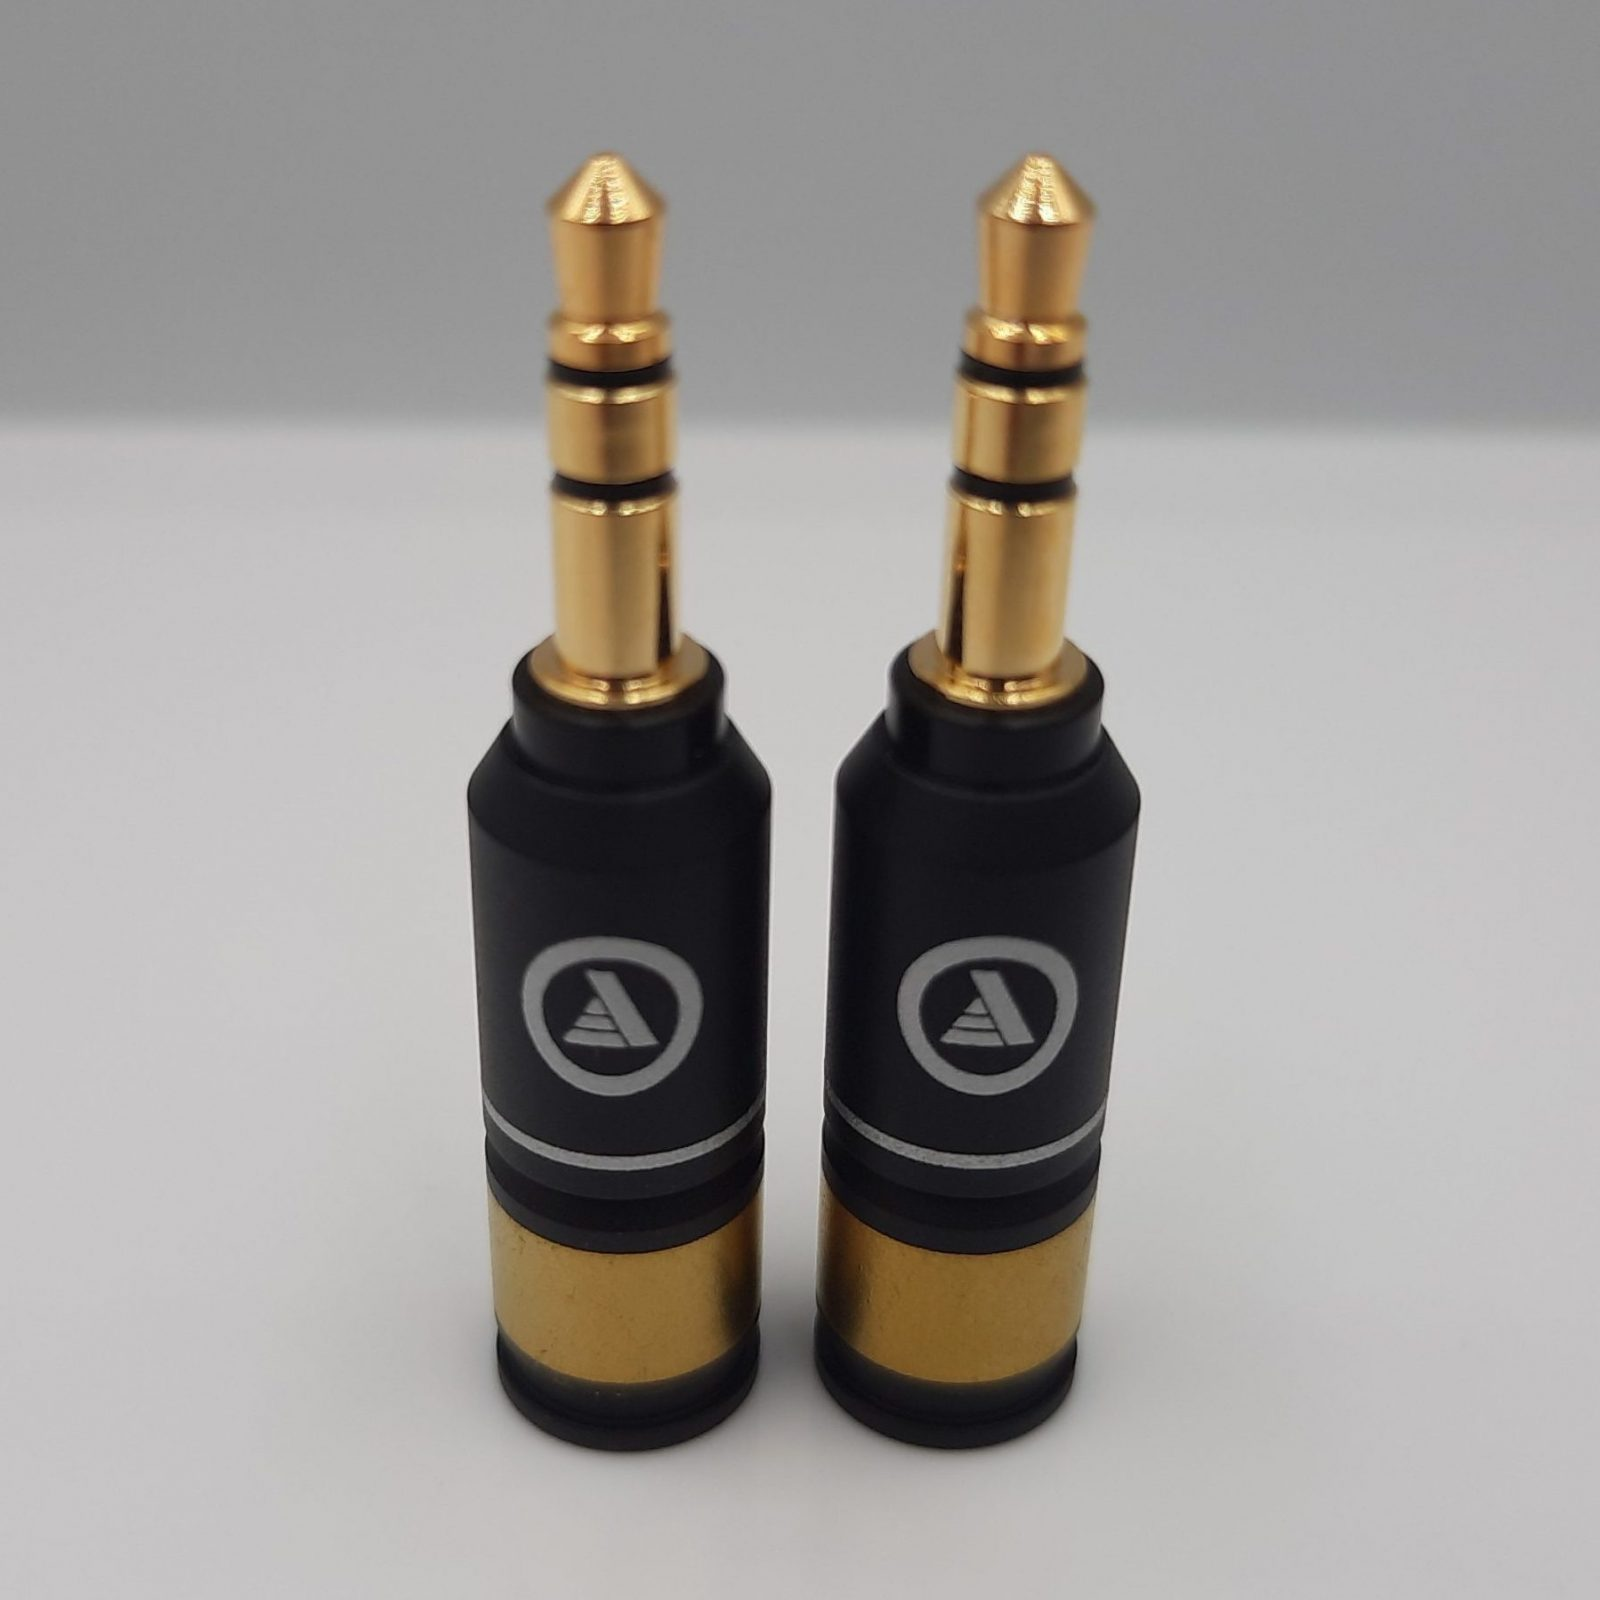 VIABLUE T6s Klinke 3.5mm Small